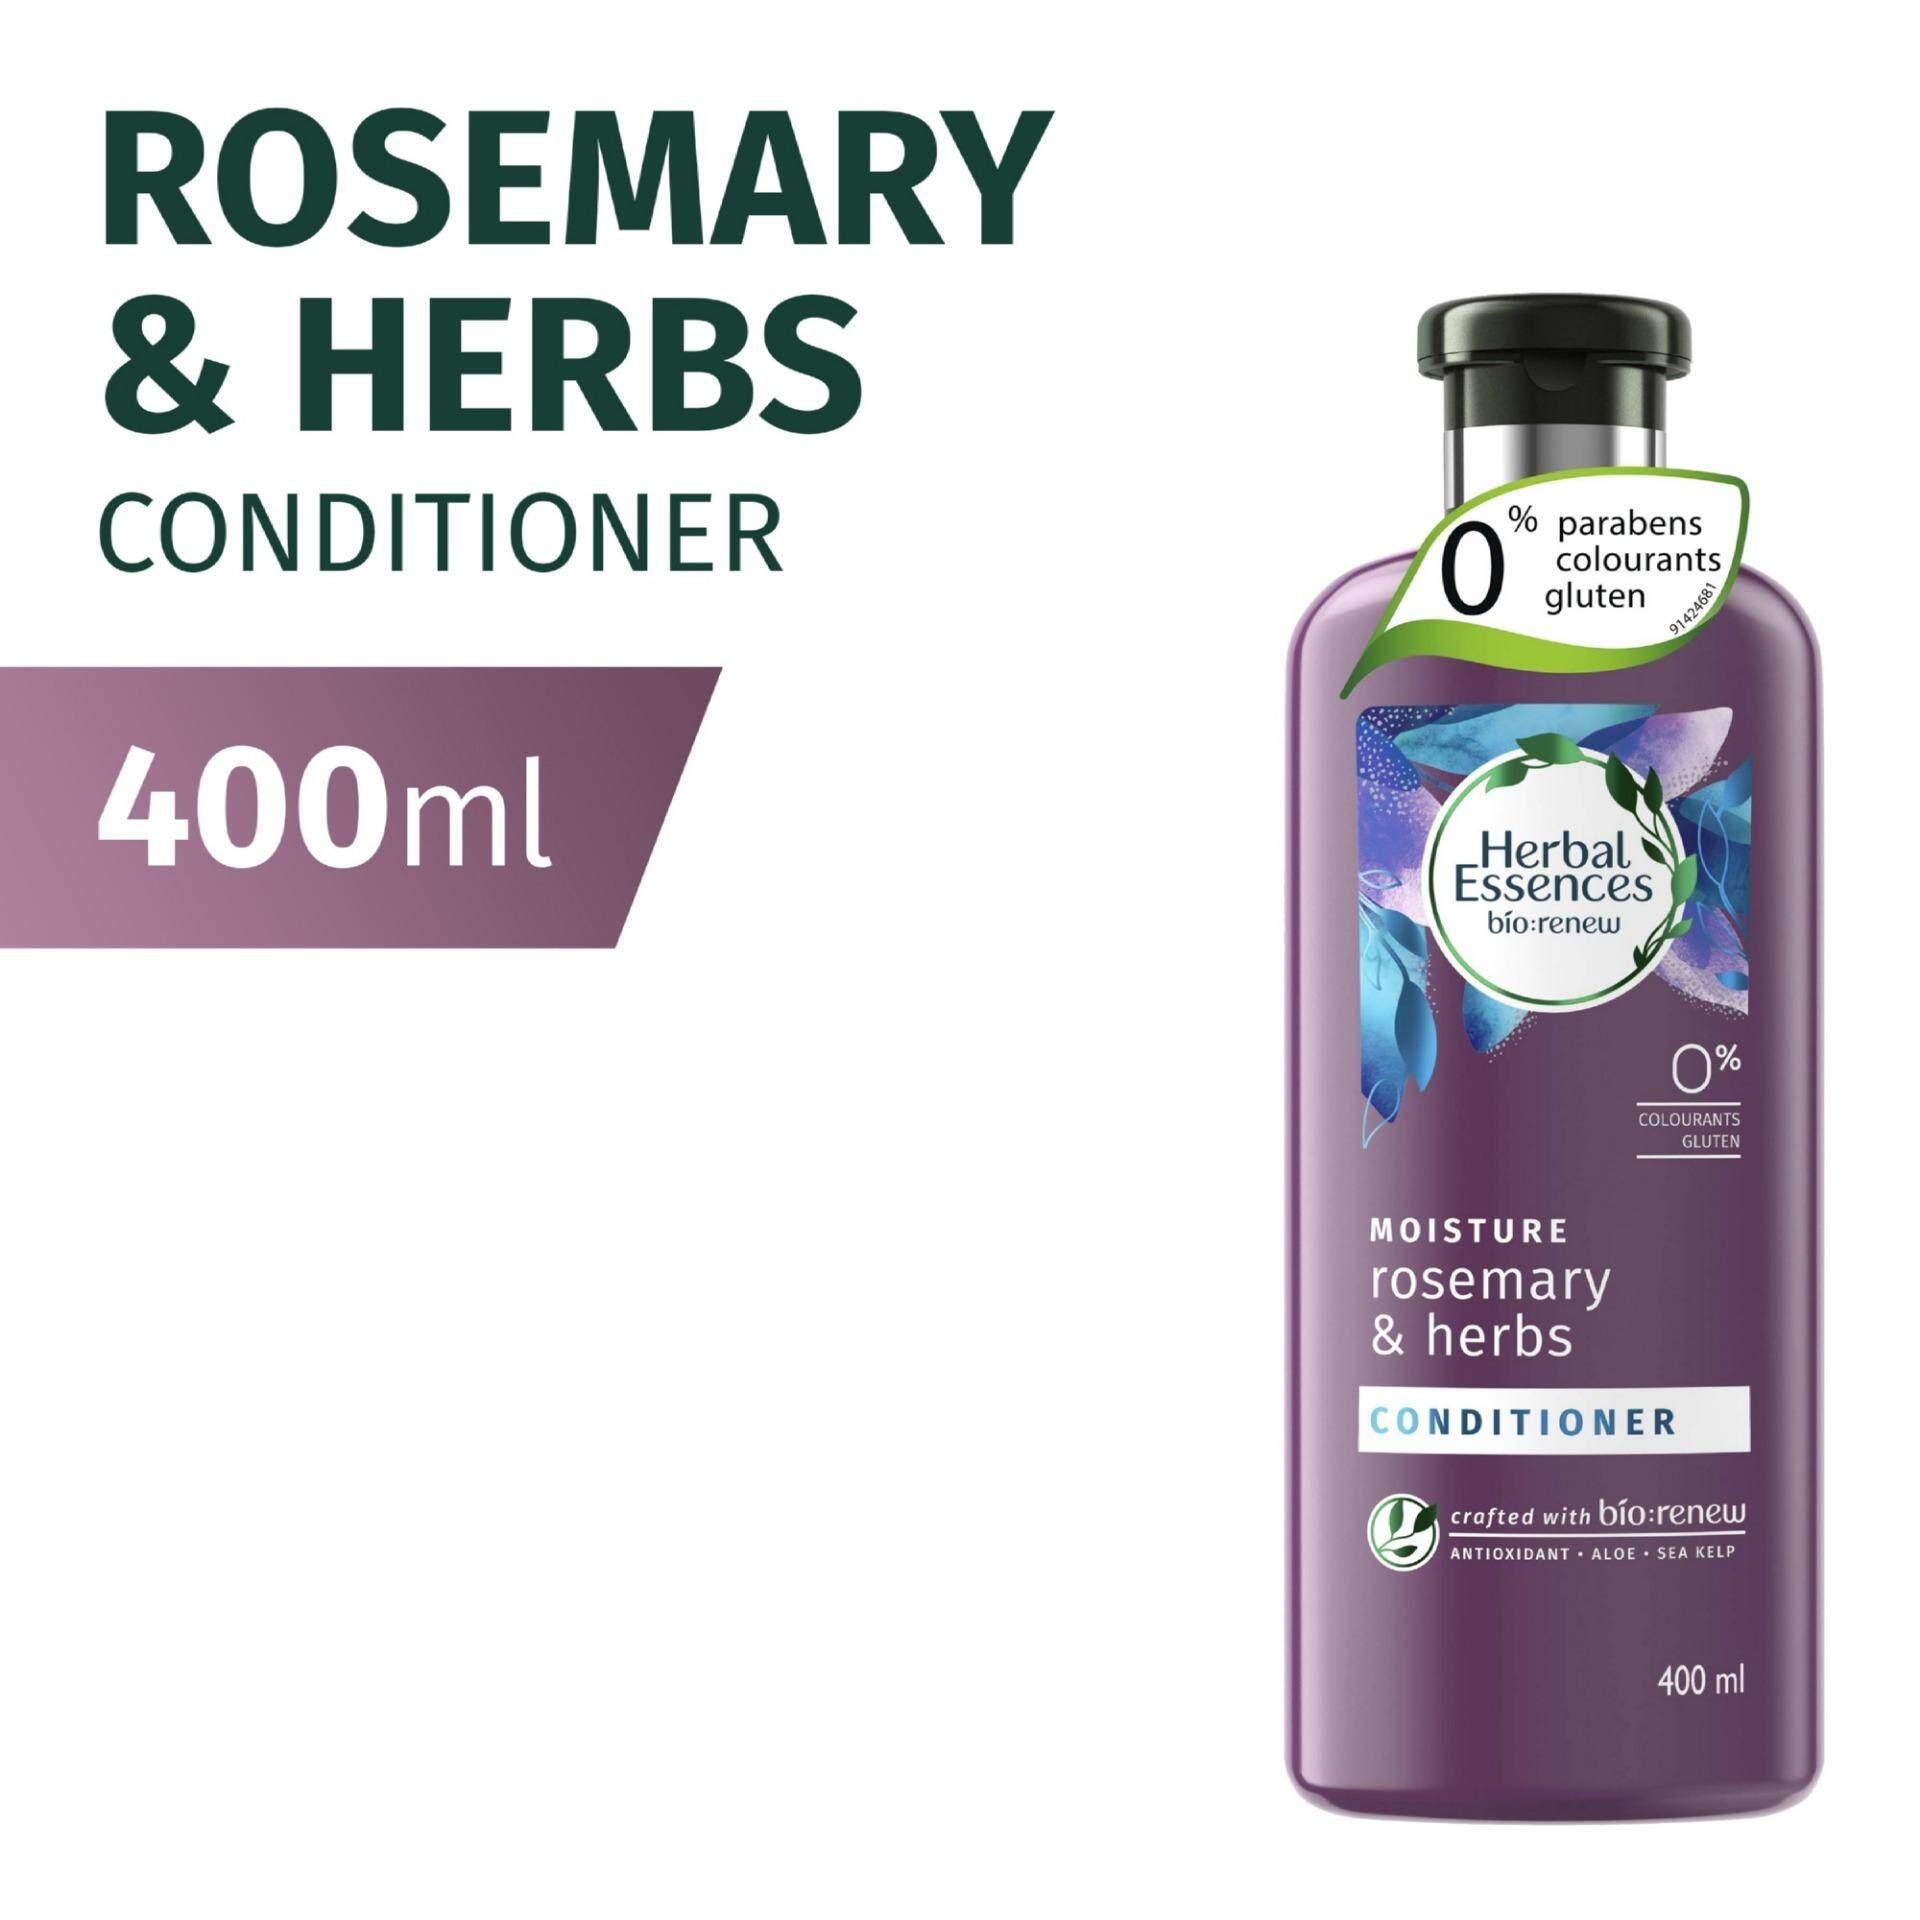 Herbal Essences Bio:Renew MOISTURE Rosemary & Herbs Conditioner 400ml